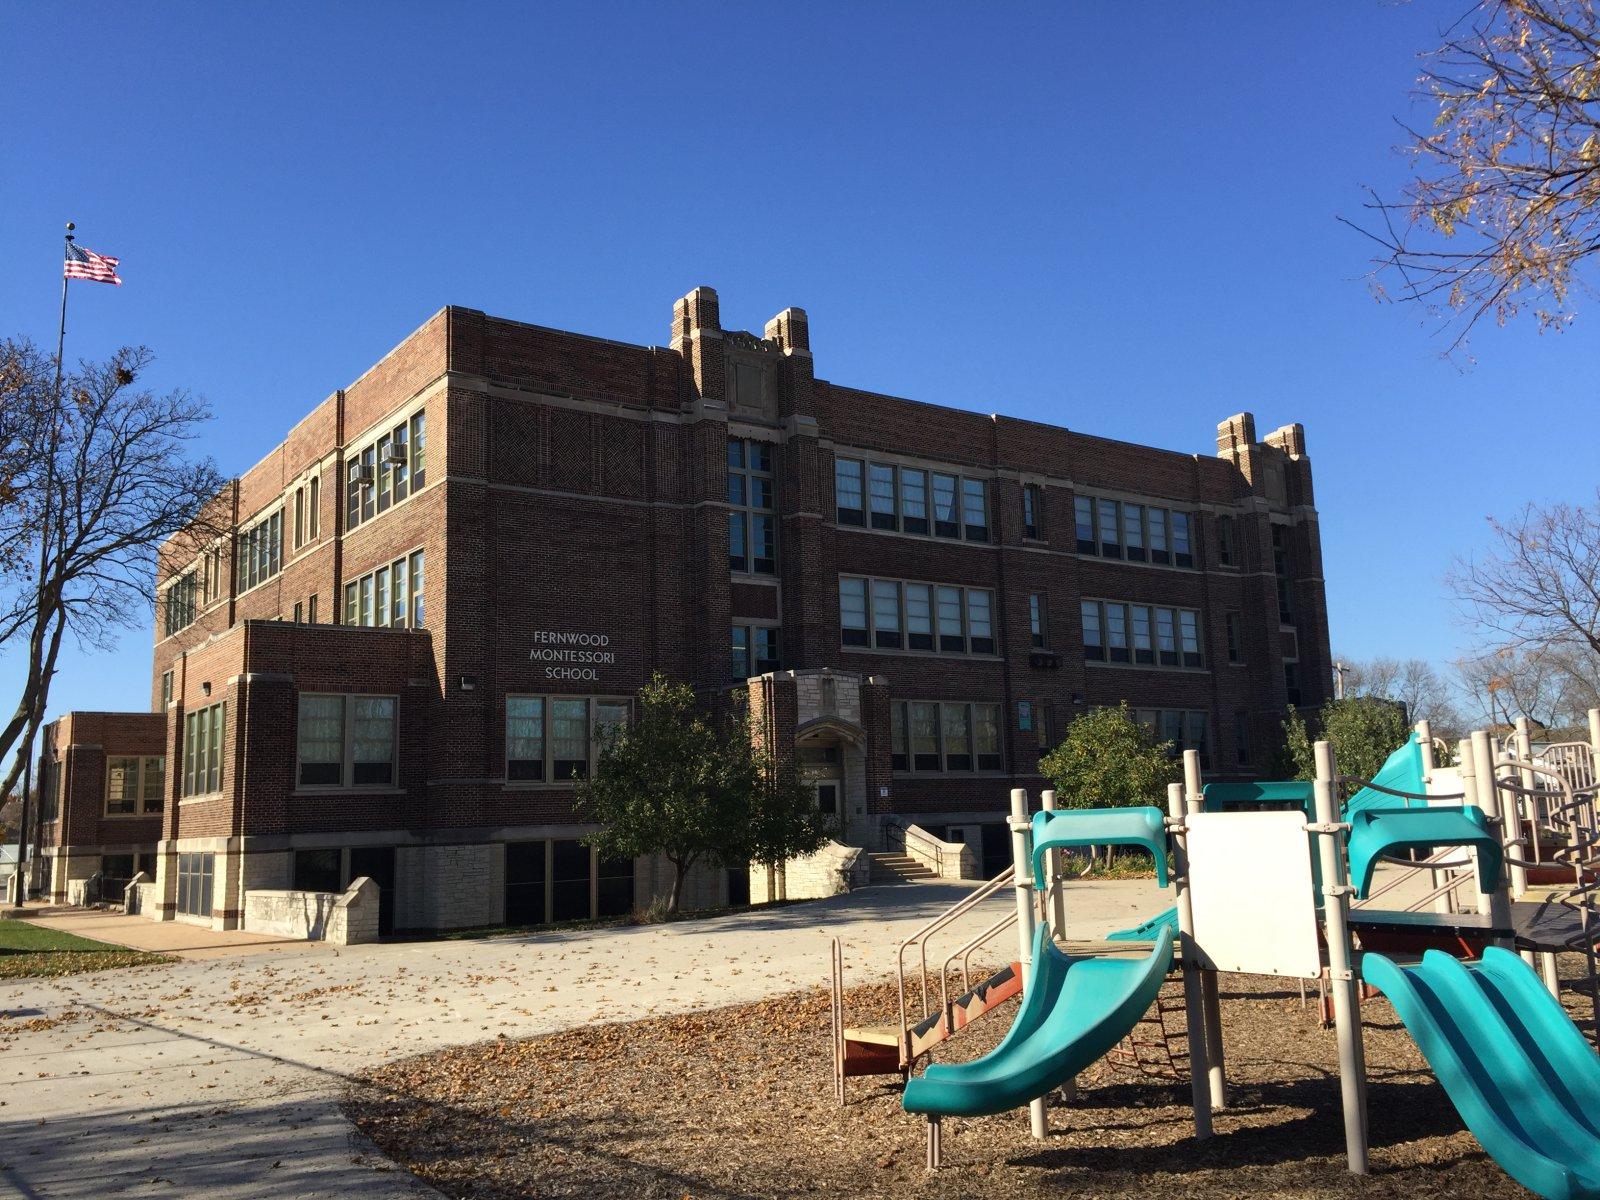 Fernwood Montessori School